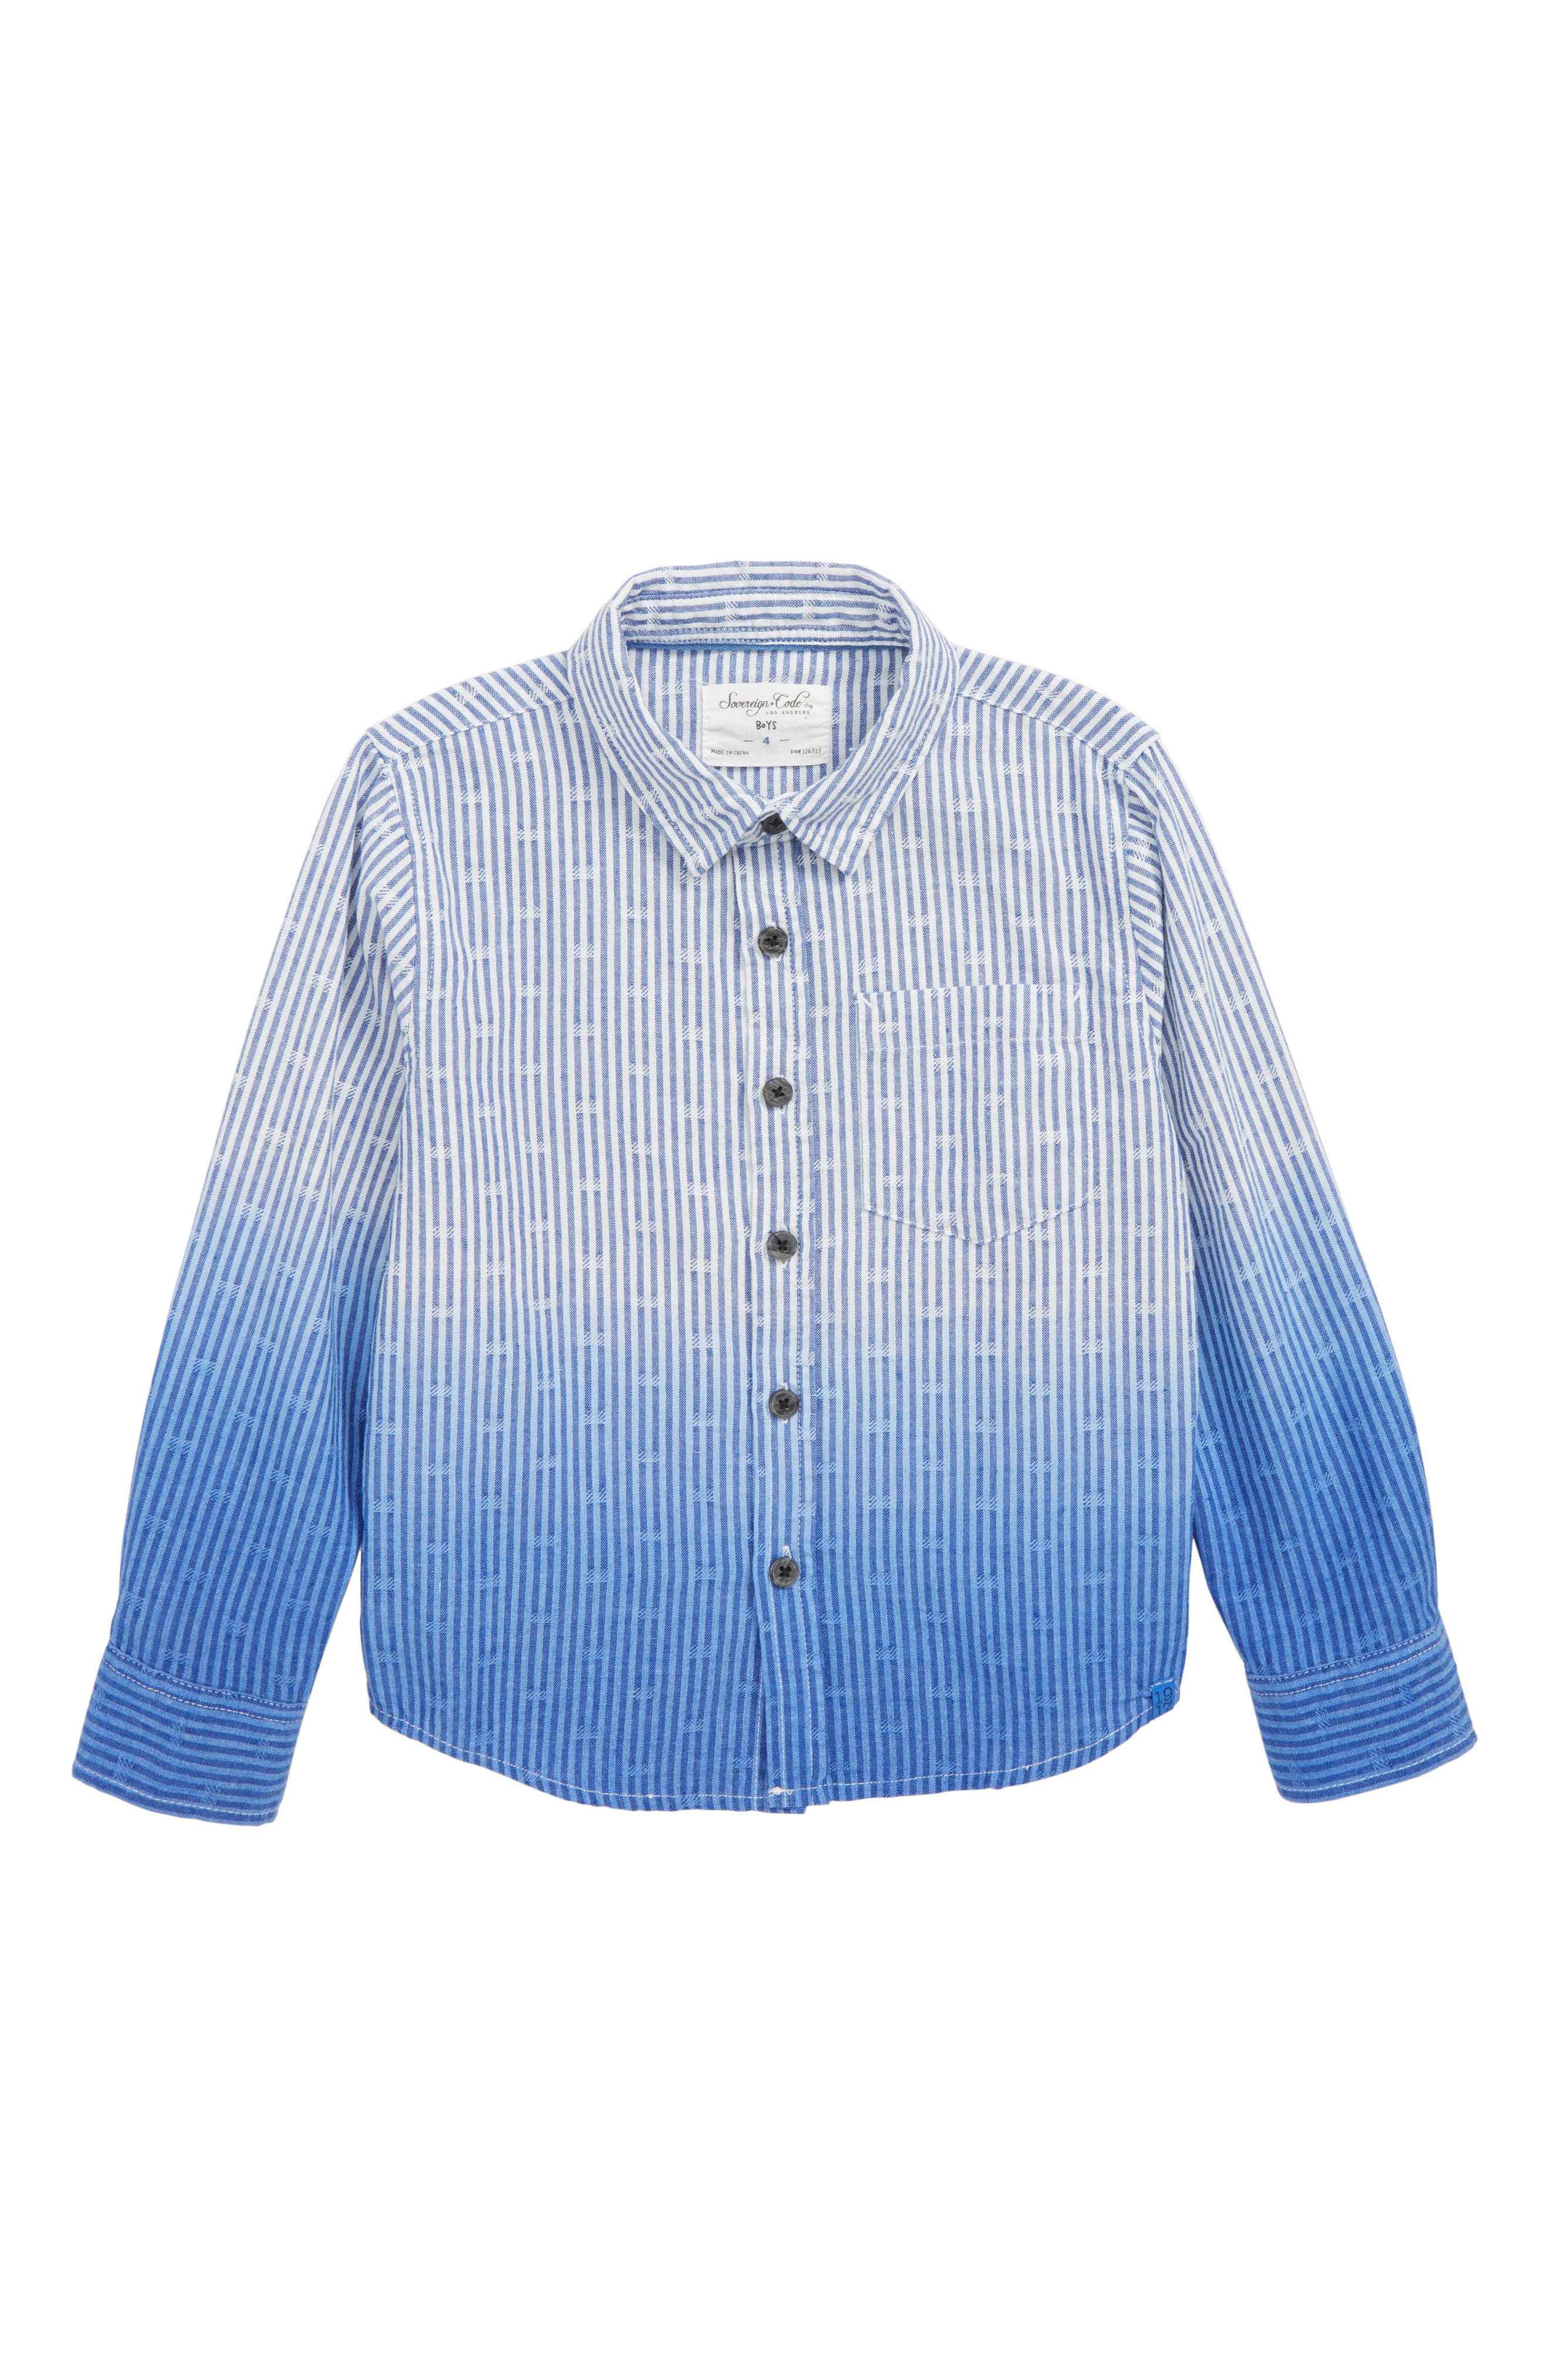 Capitola Shirt,                             Main thumbnail 1, color,                             Blue Stripe